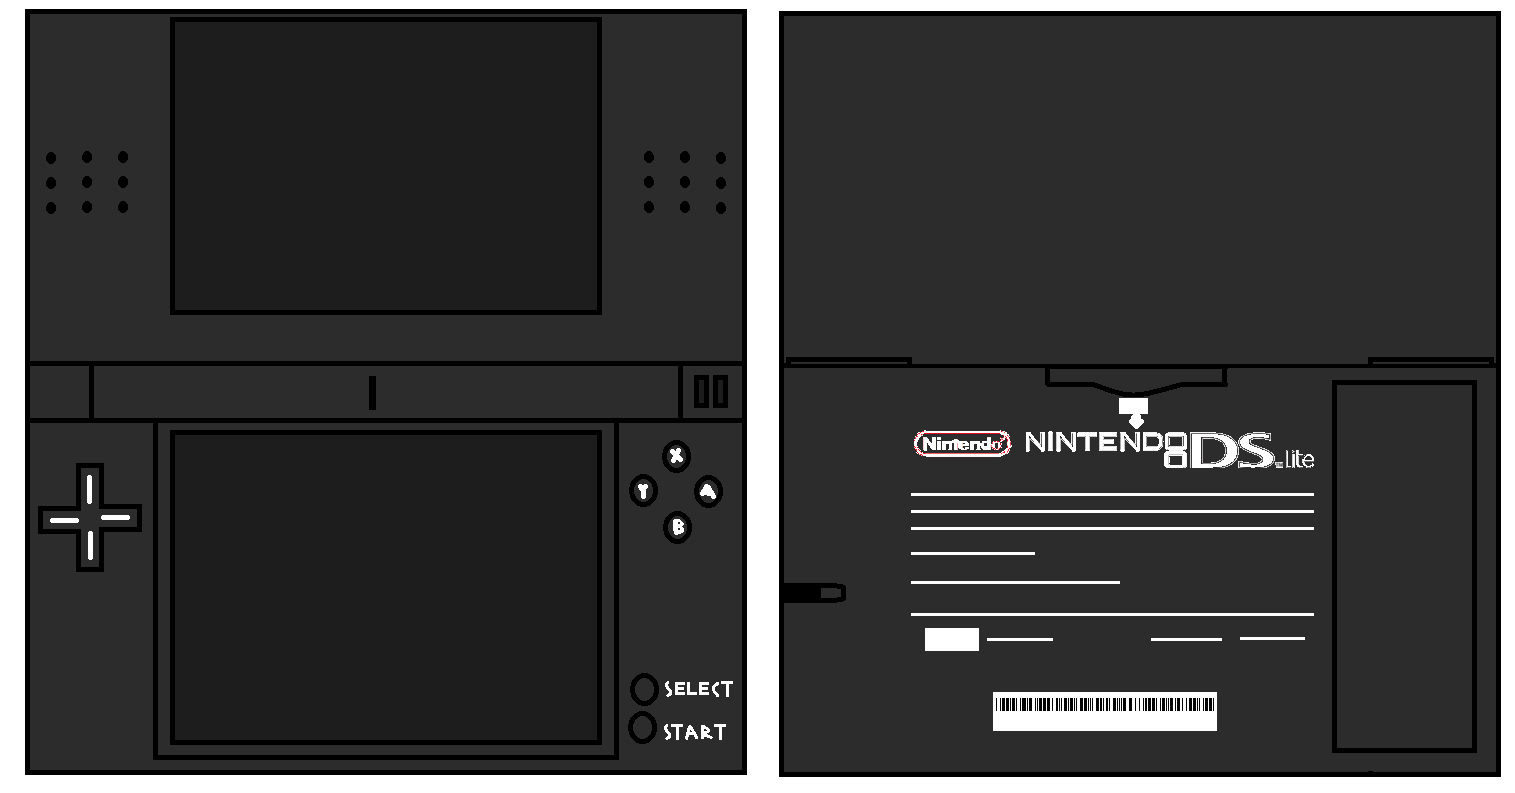 Nintendofan12s Papercraft Things Images Ds Lite Black Hd Wallpaper Nintendo Edge And Background Photos